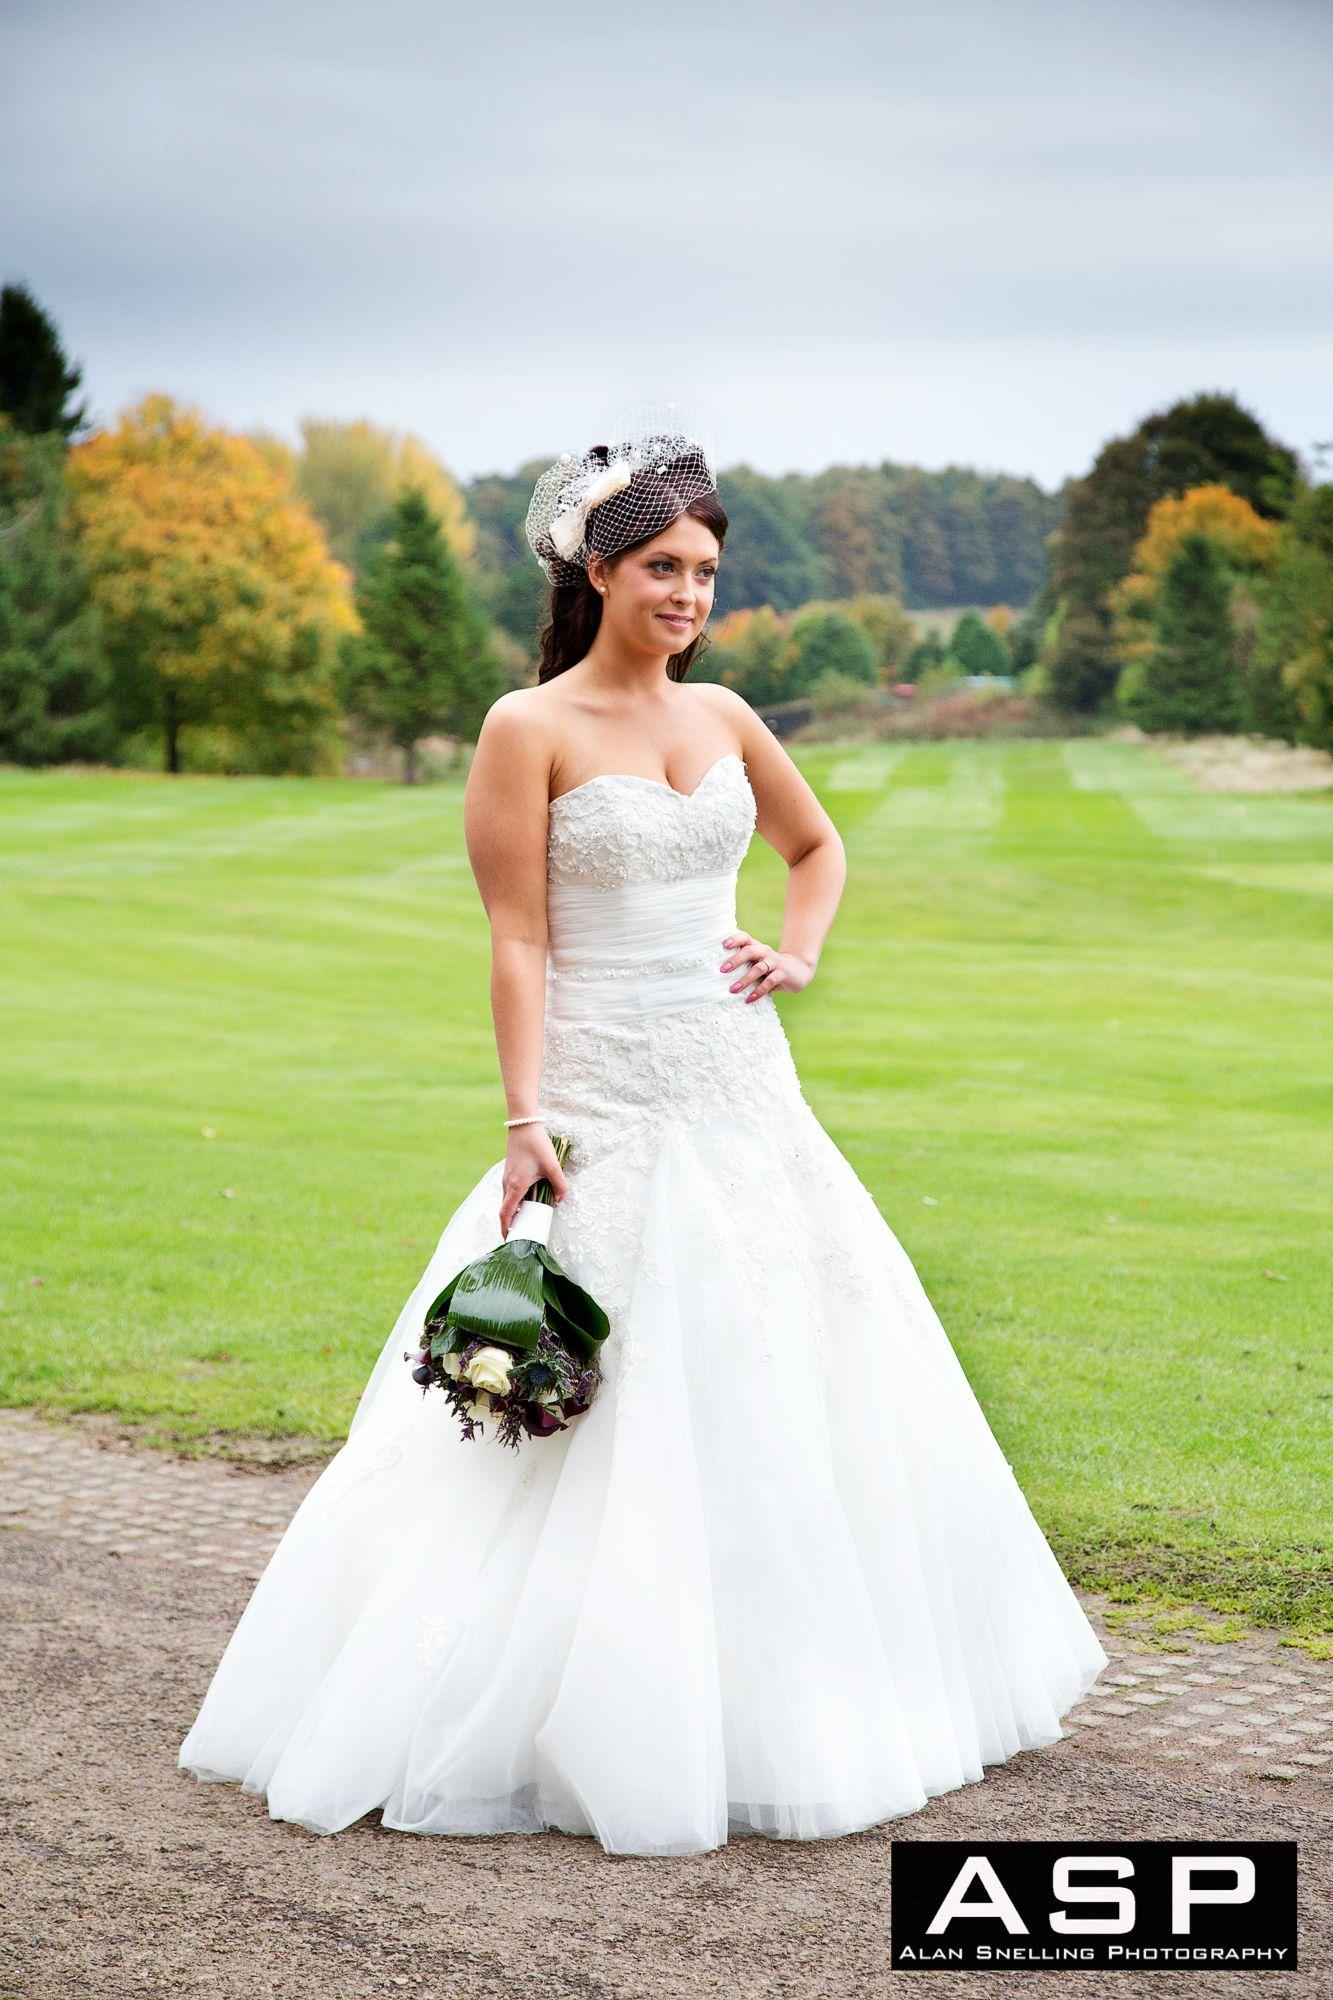 A stunning bride in her beautiful wedding dress, taken during her ...